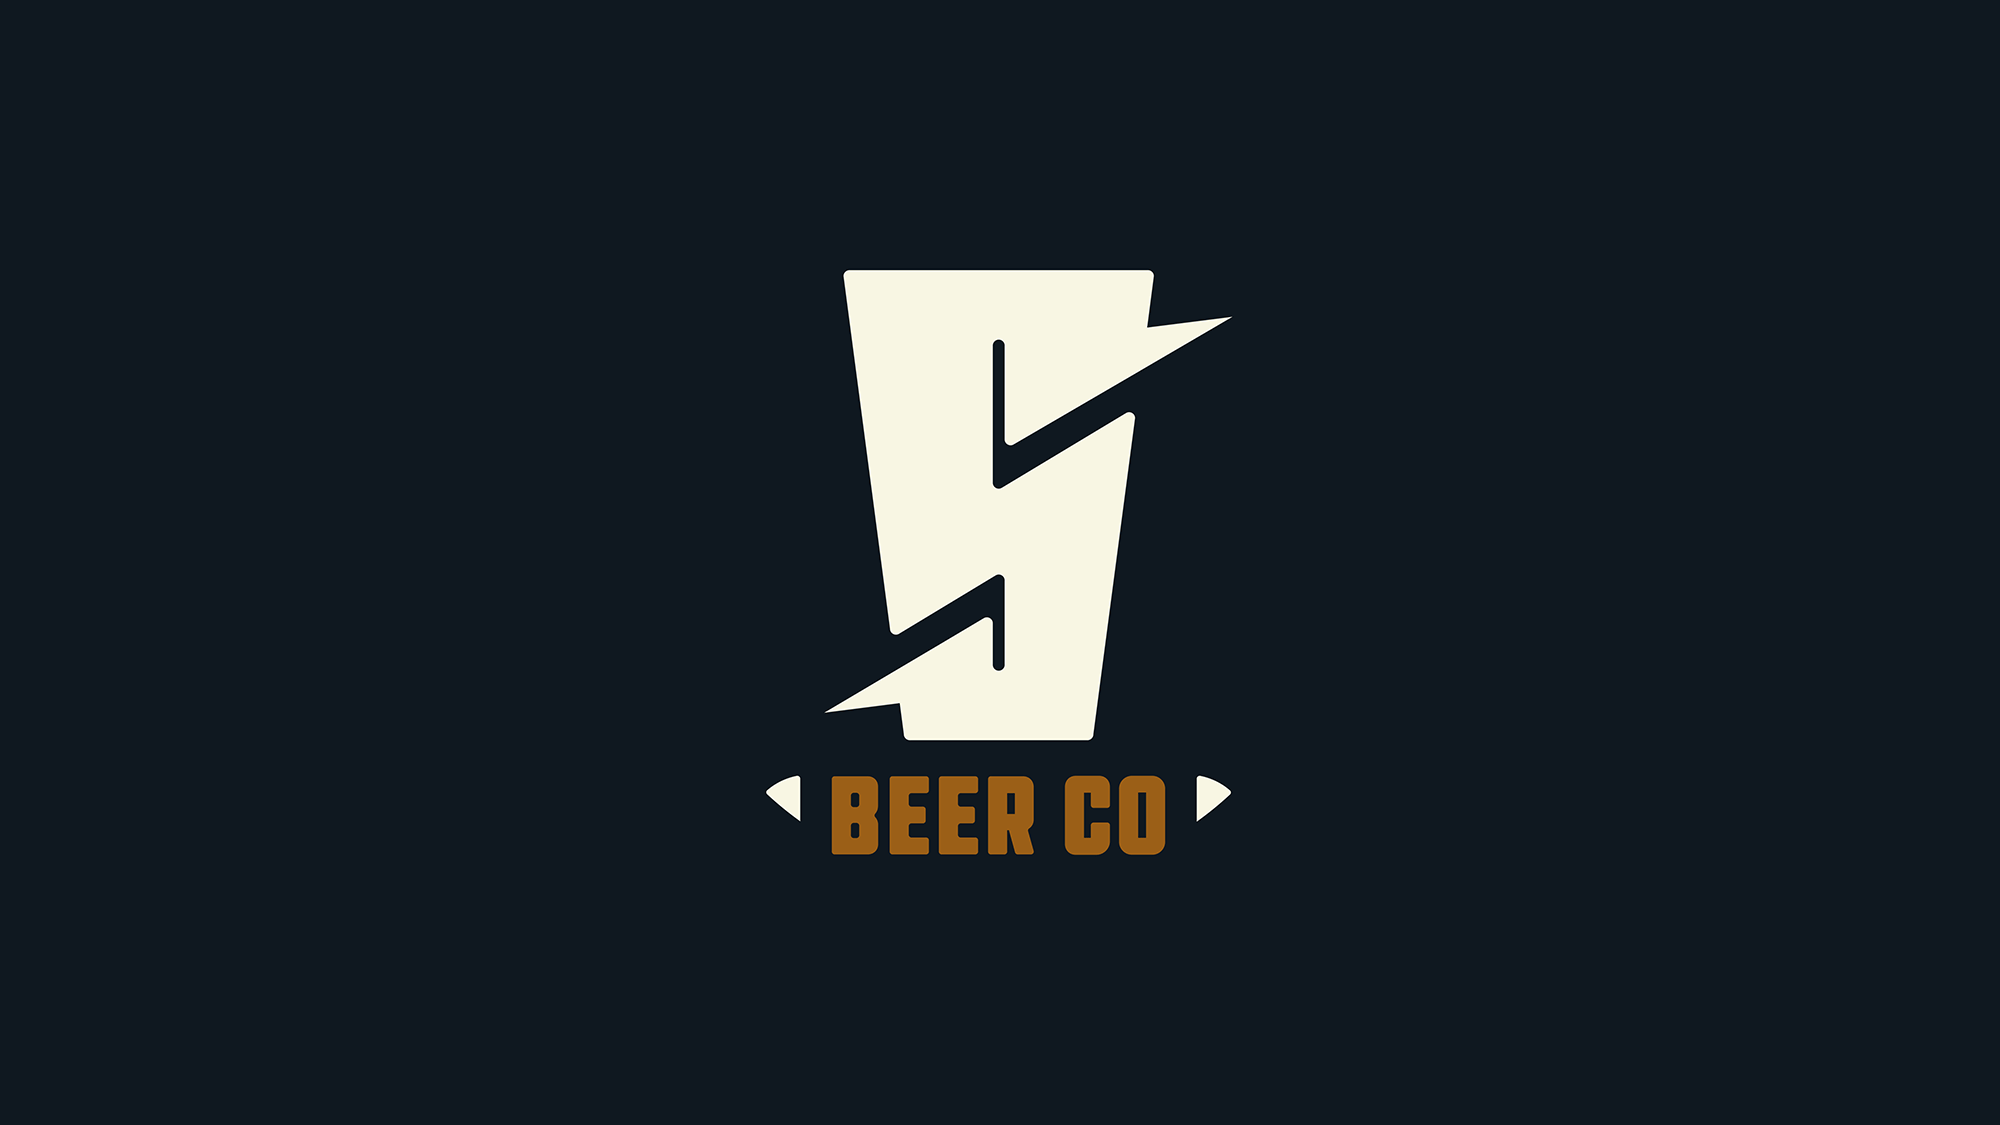 微型酿酒厂Slice Beer Co品牌形象设计